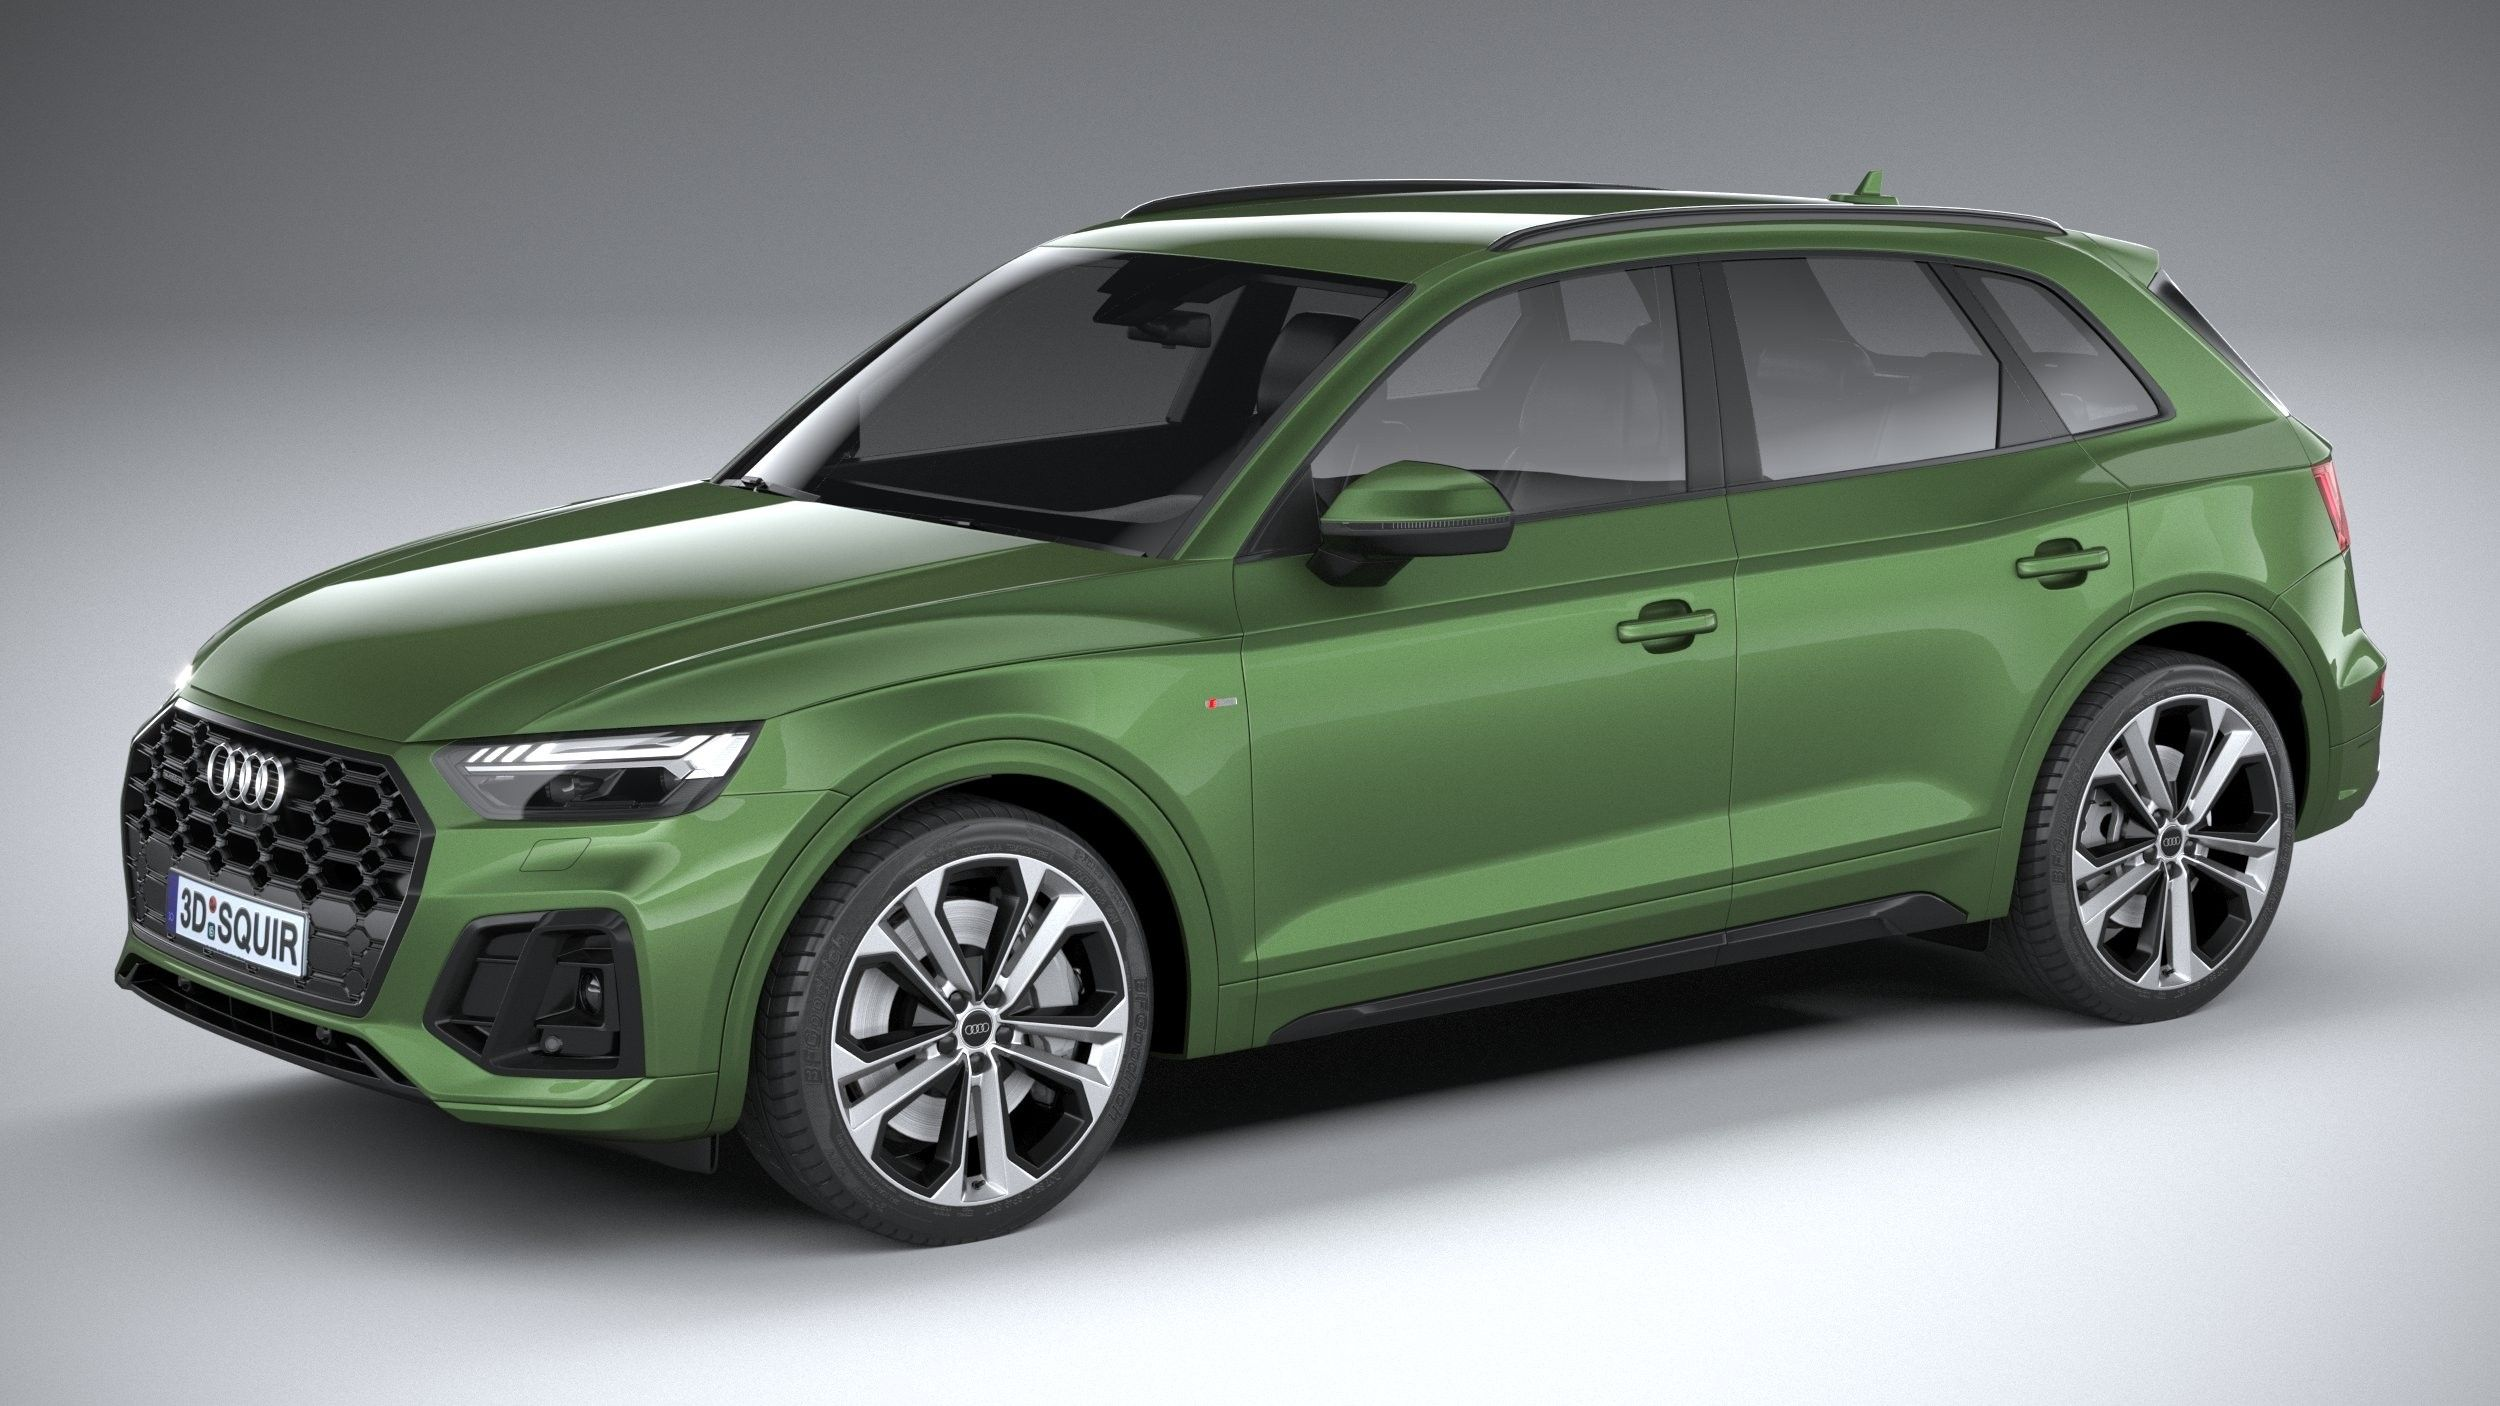 Audi Q5 S Line 2021 Audi Q5 Q5 S Line Audi